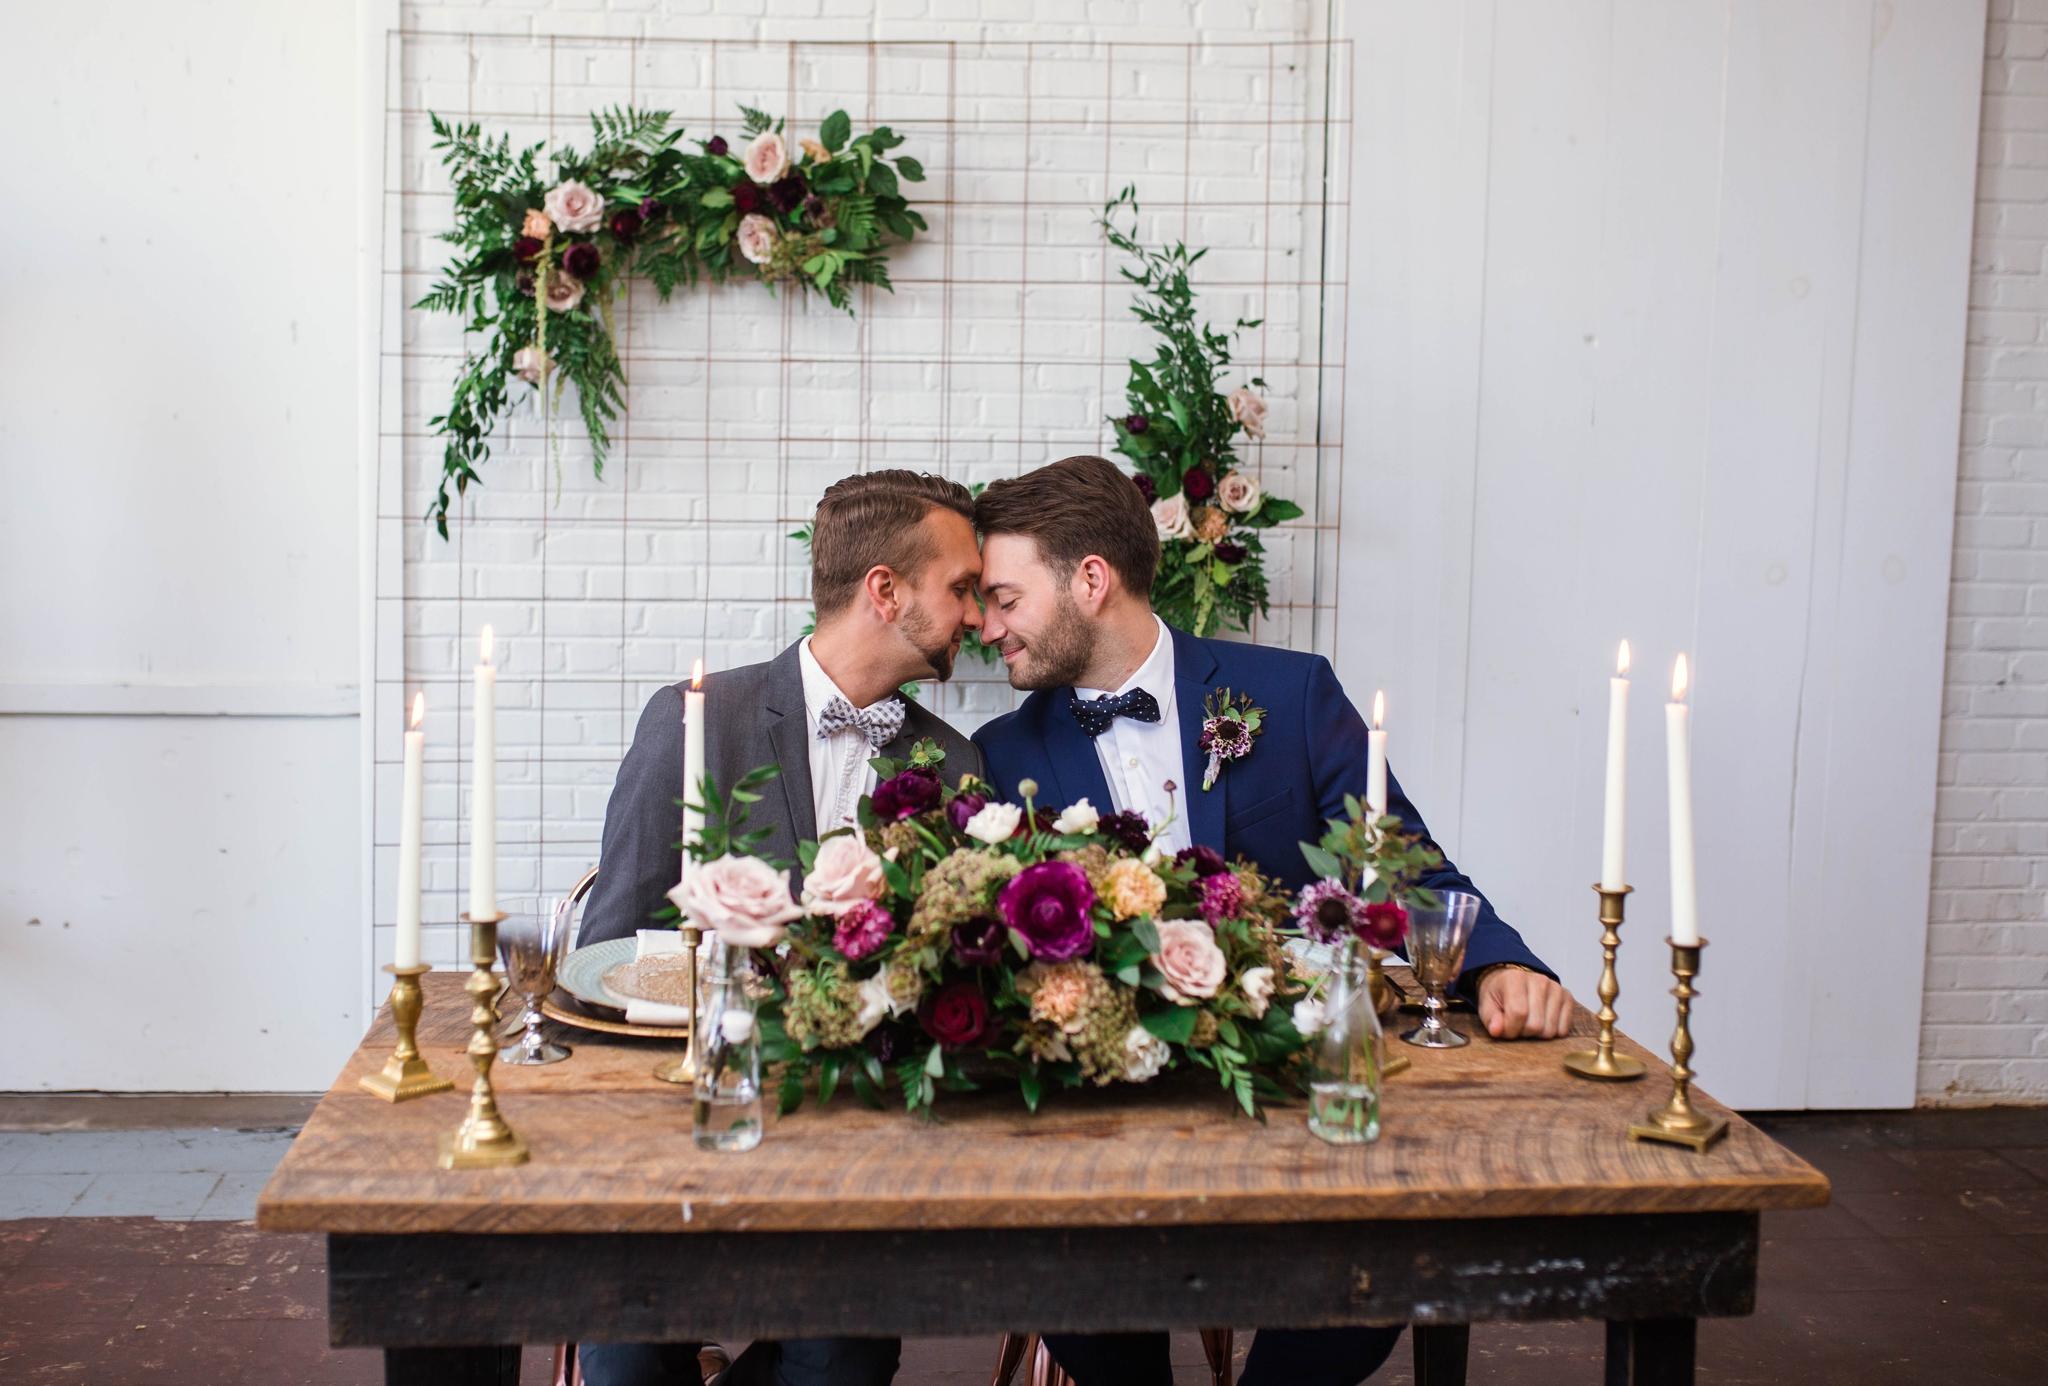 Gay and Lesbian friendly Wedding Photographer in Raleigh North Carolina - Johanna Dye Photography 4.jpg